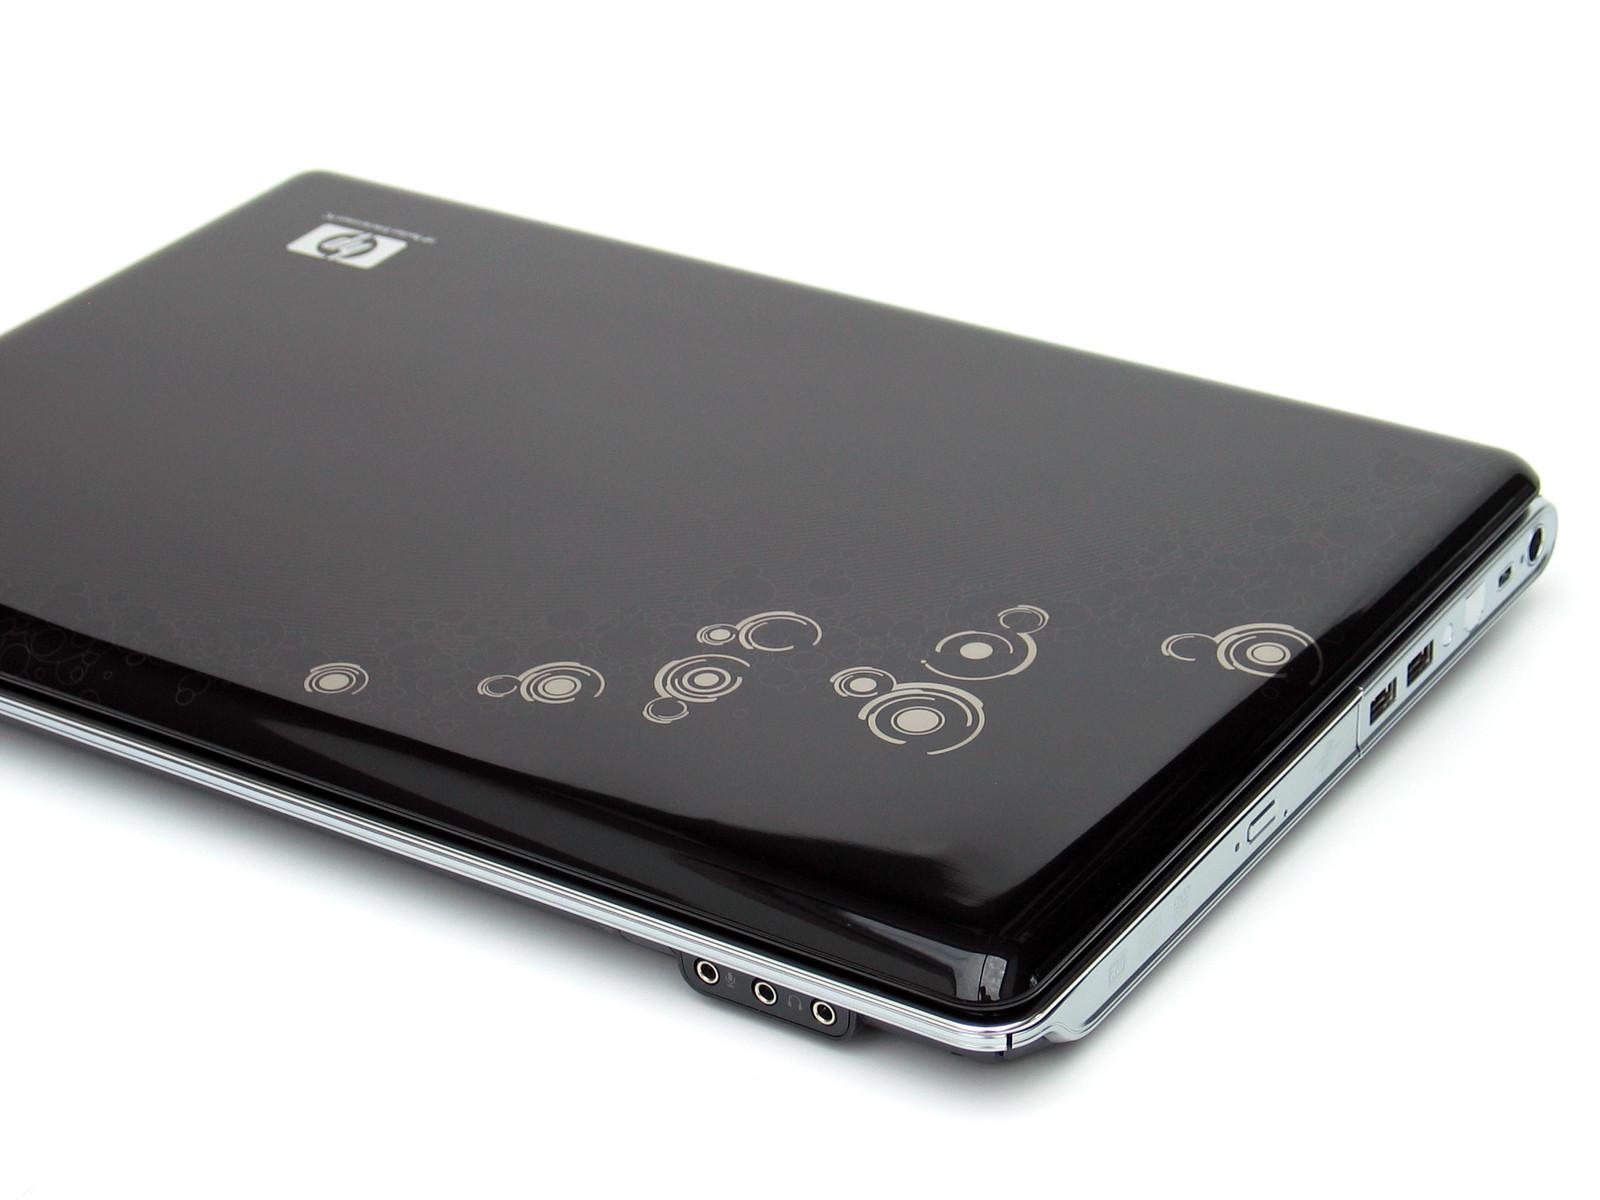 HP AMD 2009 S-class Video Windows 8